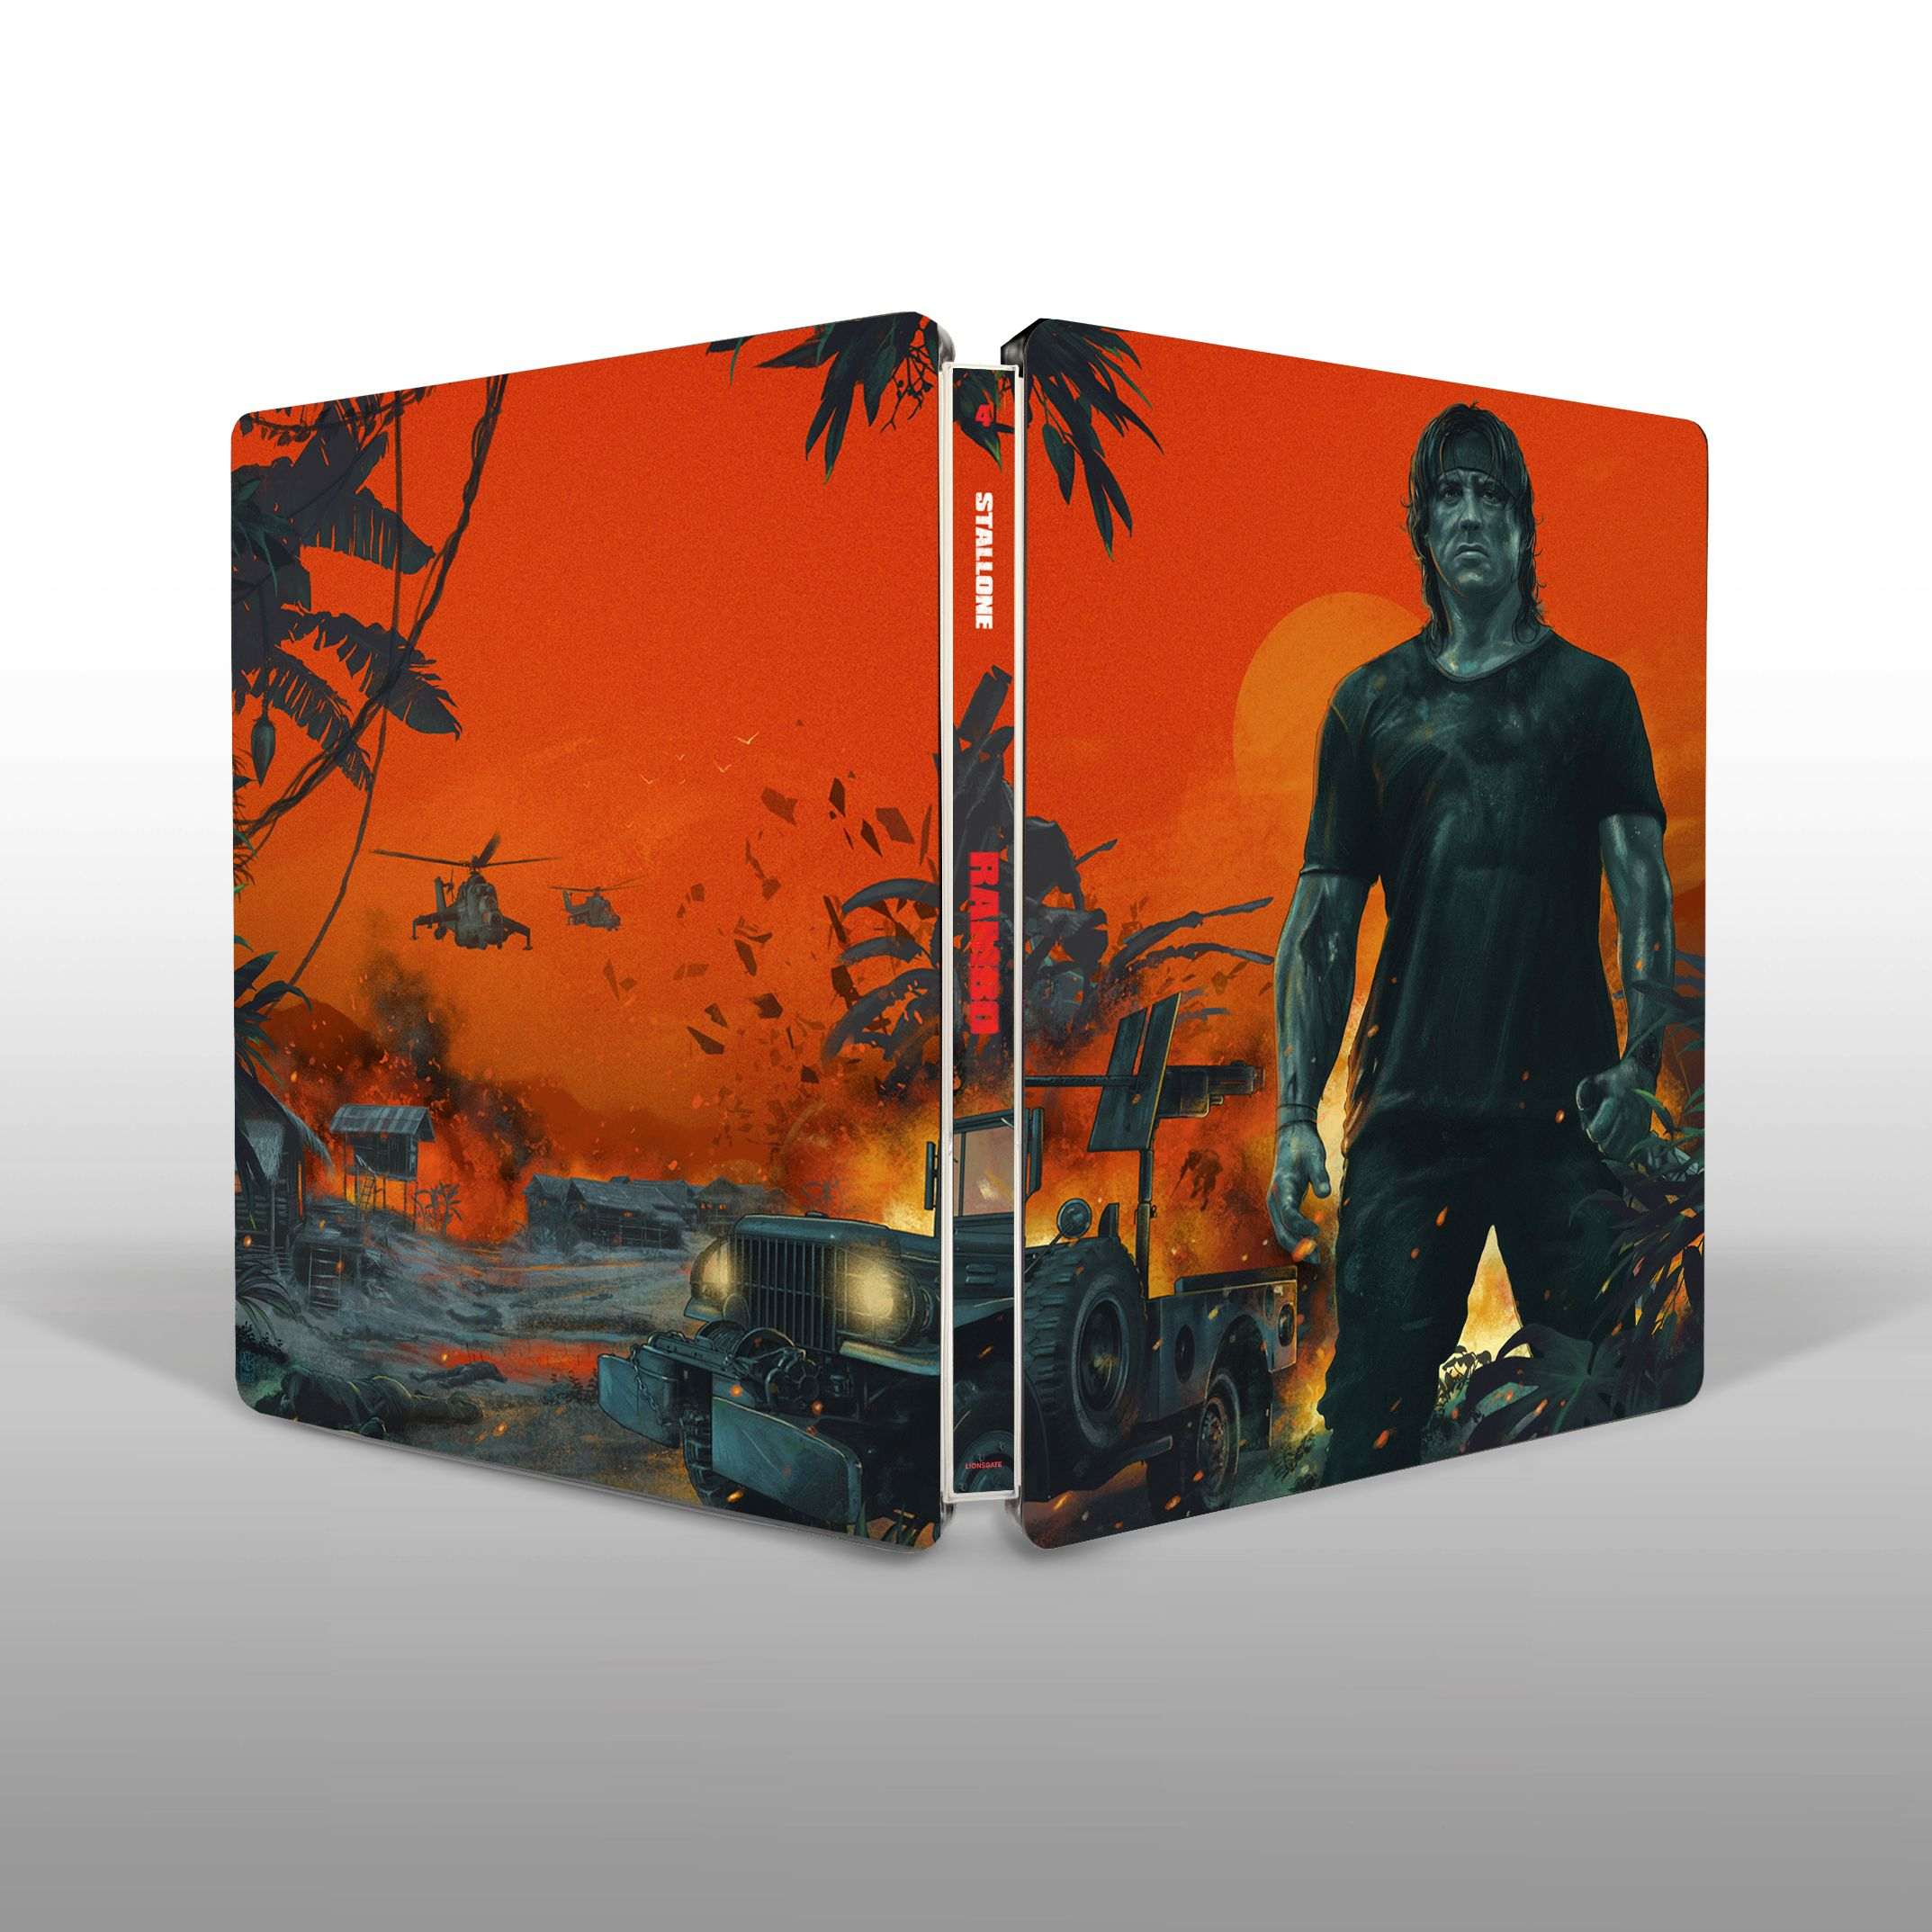 rambo-movie-steelbook-2.jpg